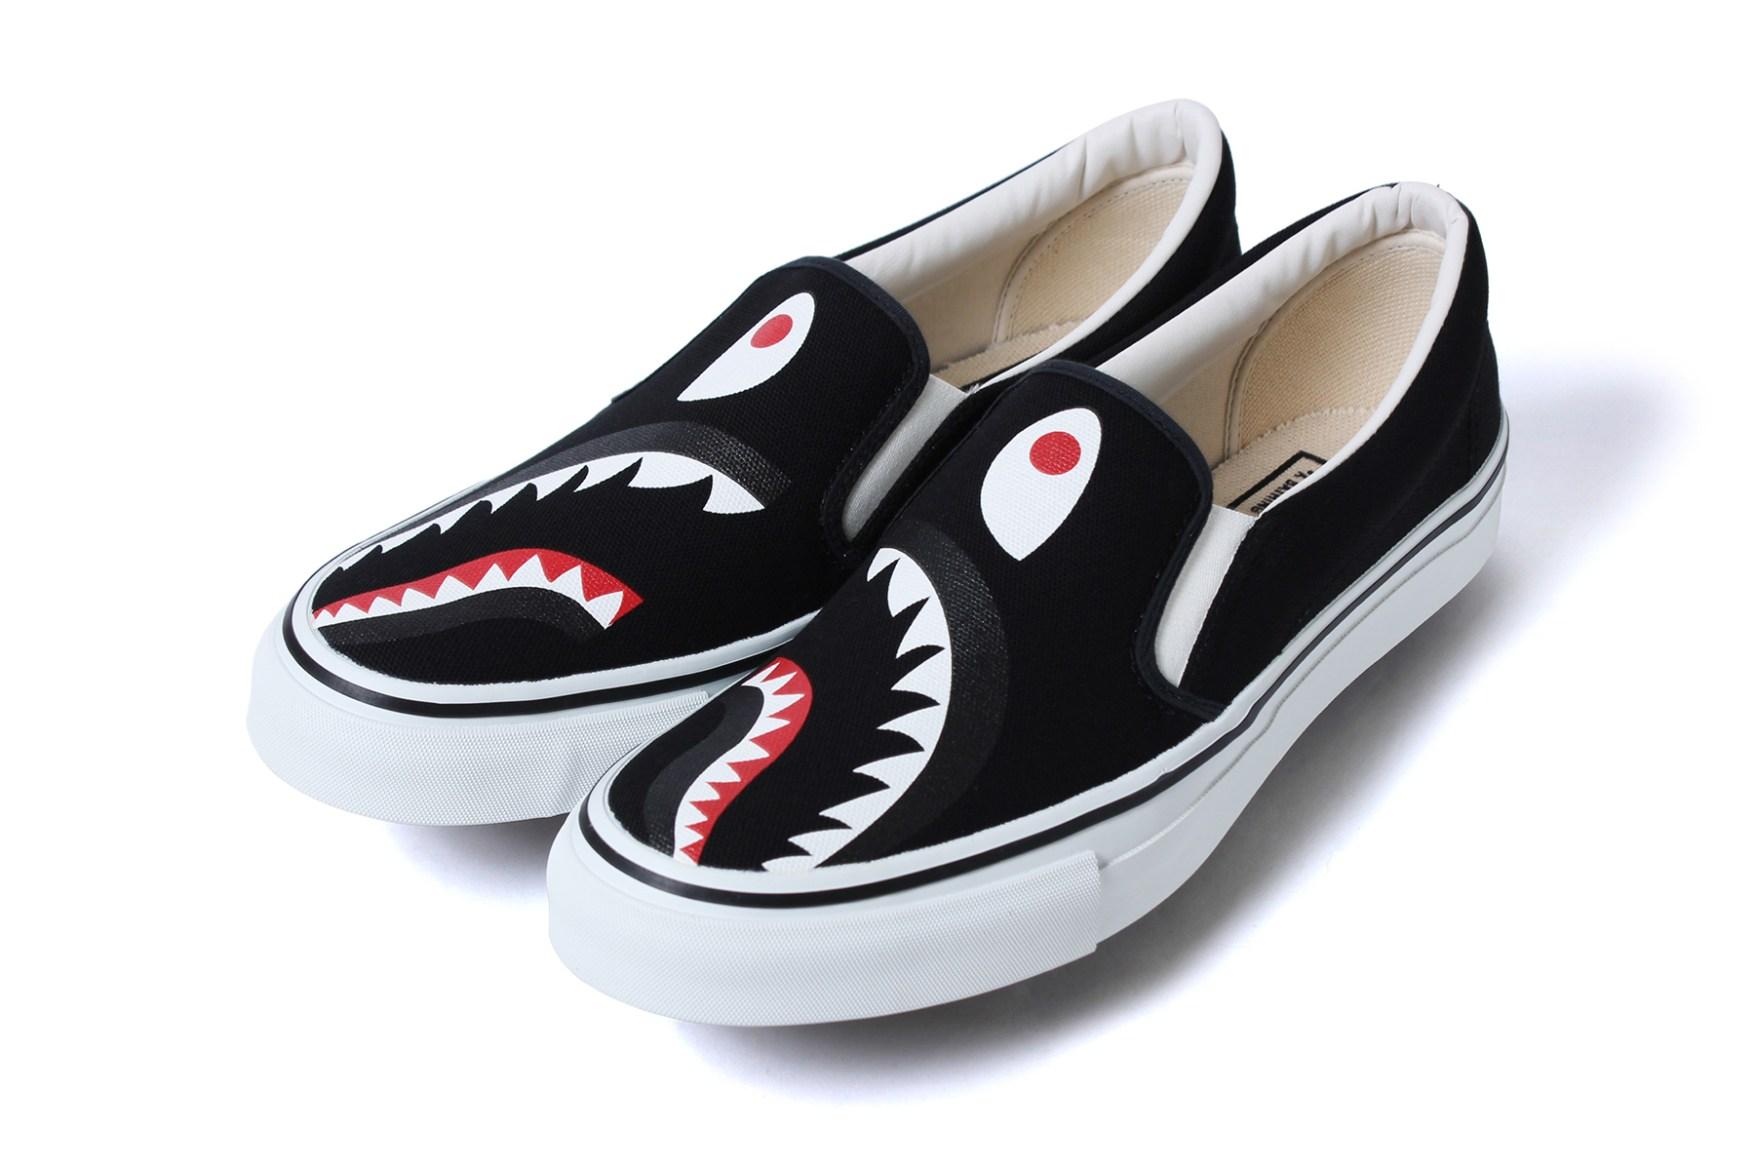 Off White Logo guYxZxBmS7IkWRx1X1uzxRQXvbTl3t3NLfYtB6YoKh4 further 47331077 Heather Gray Items additionally Bape鲨鱼手机壁纸 as well 1d30 141 002 additionally 7504230 New Shark Releases. on bape shark